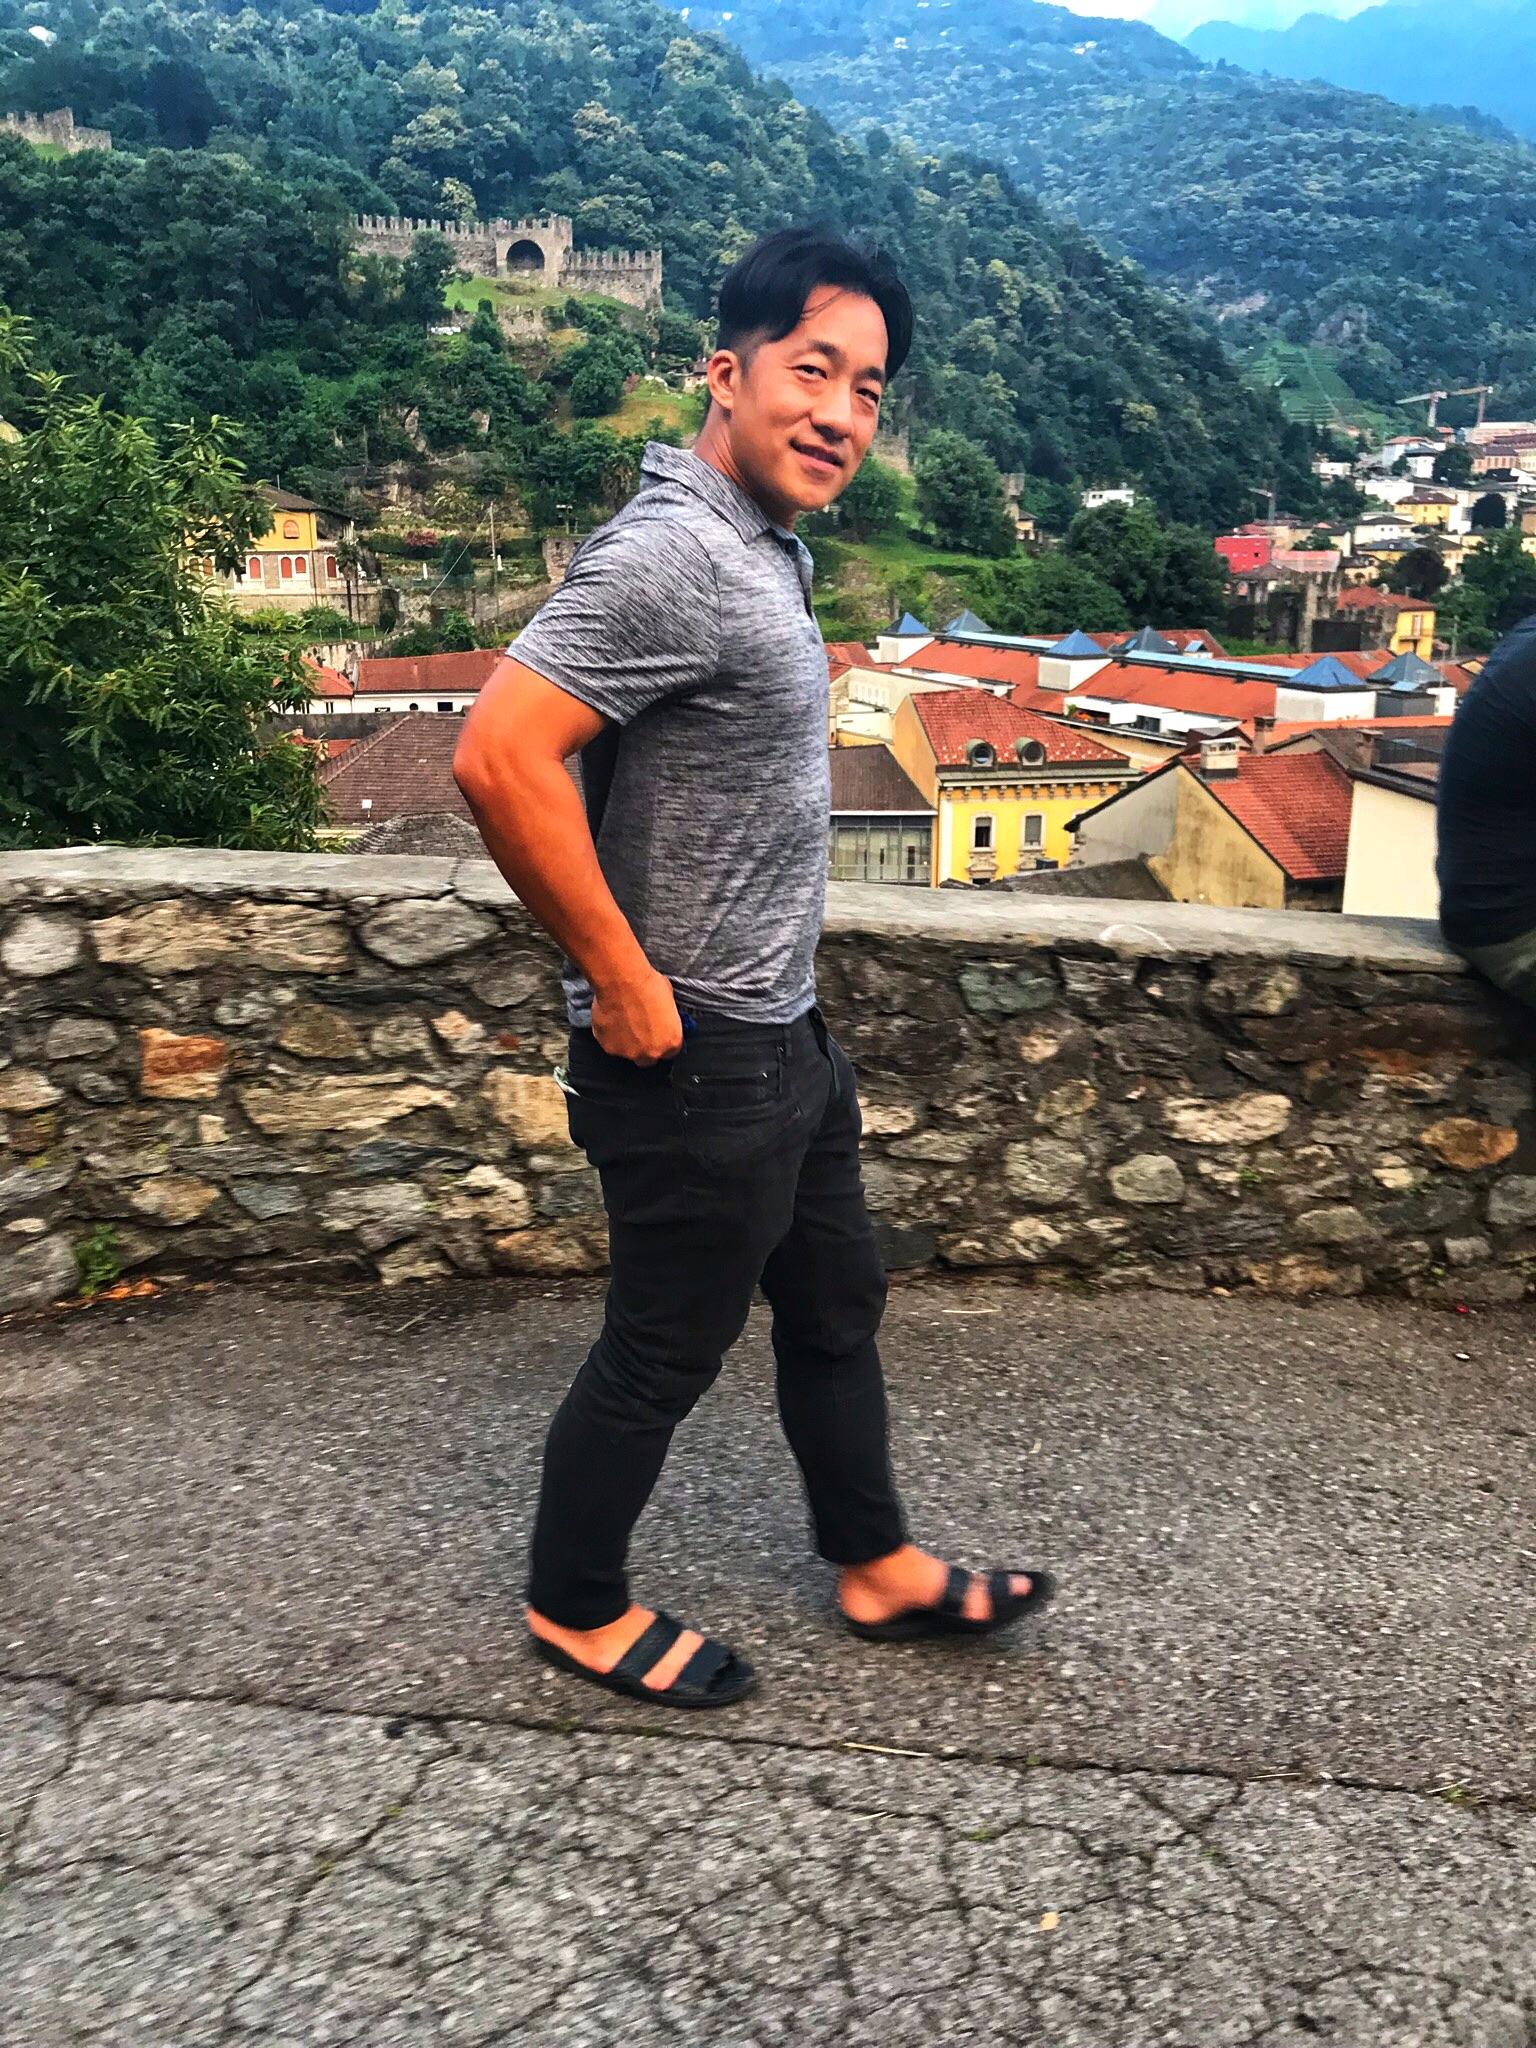 Keane's rocking his mountain sandals.